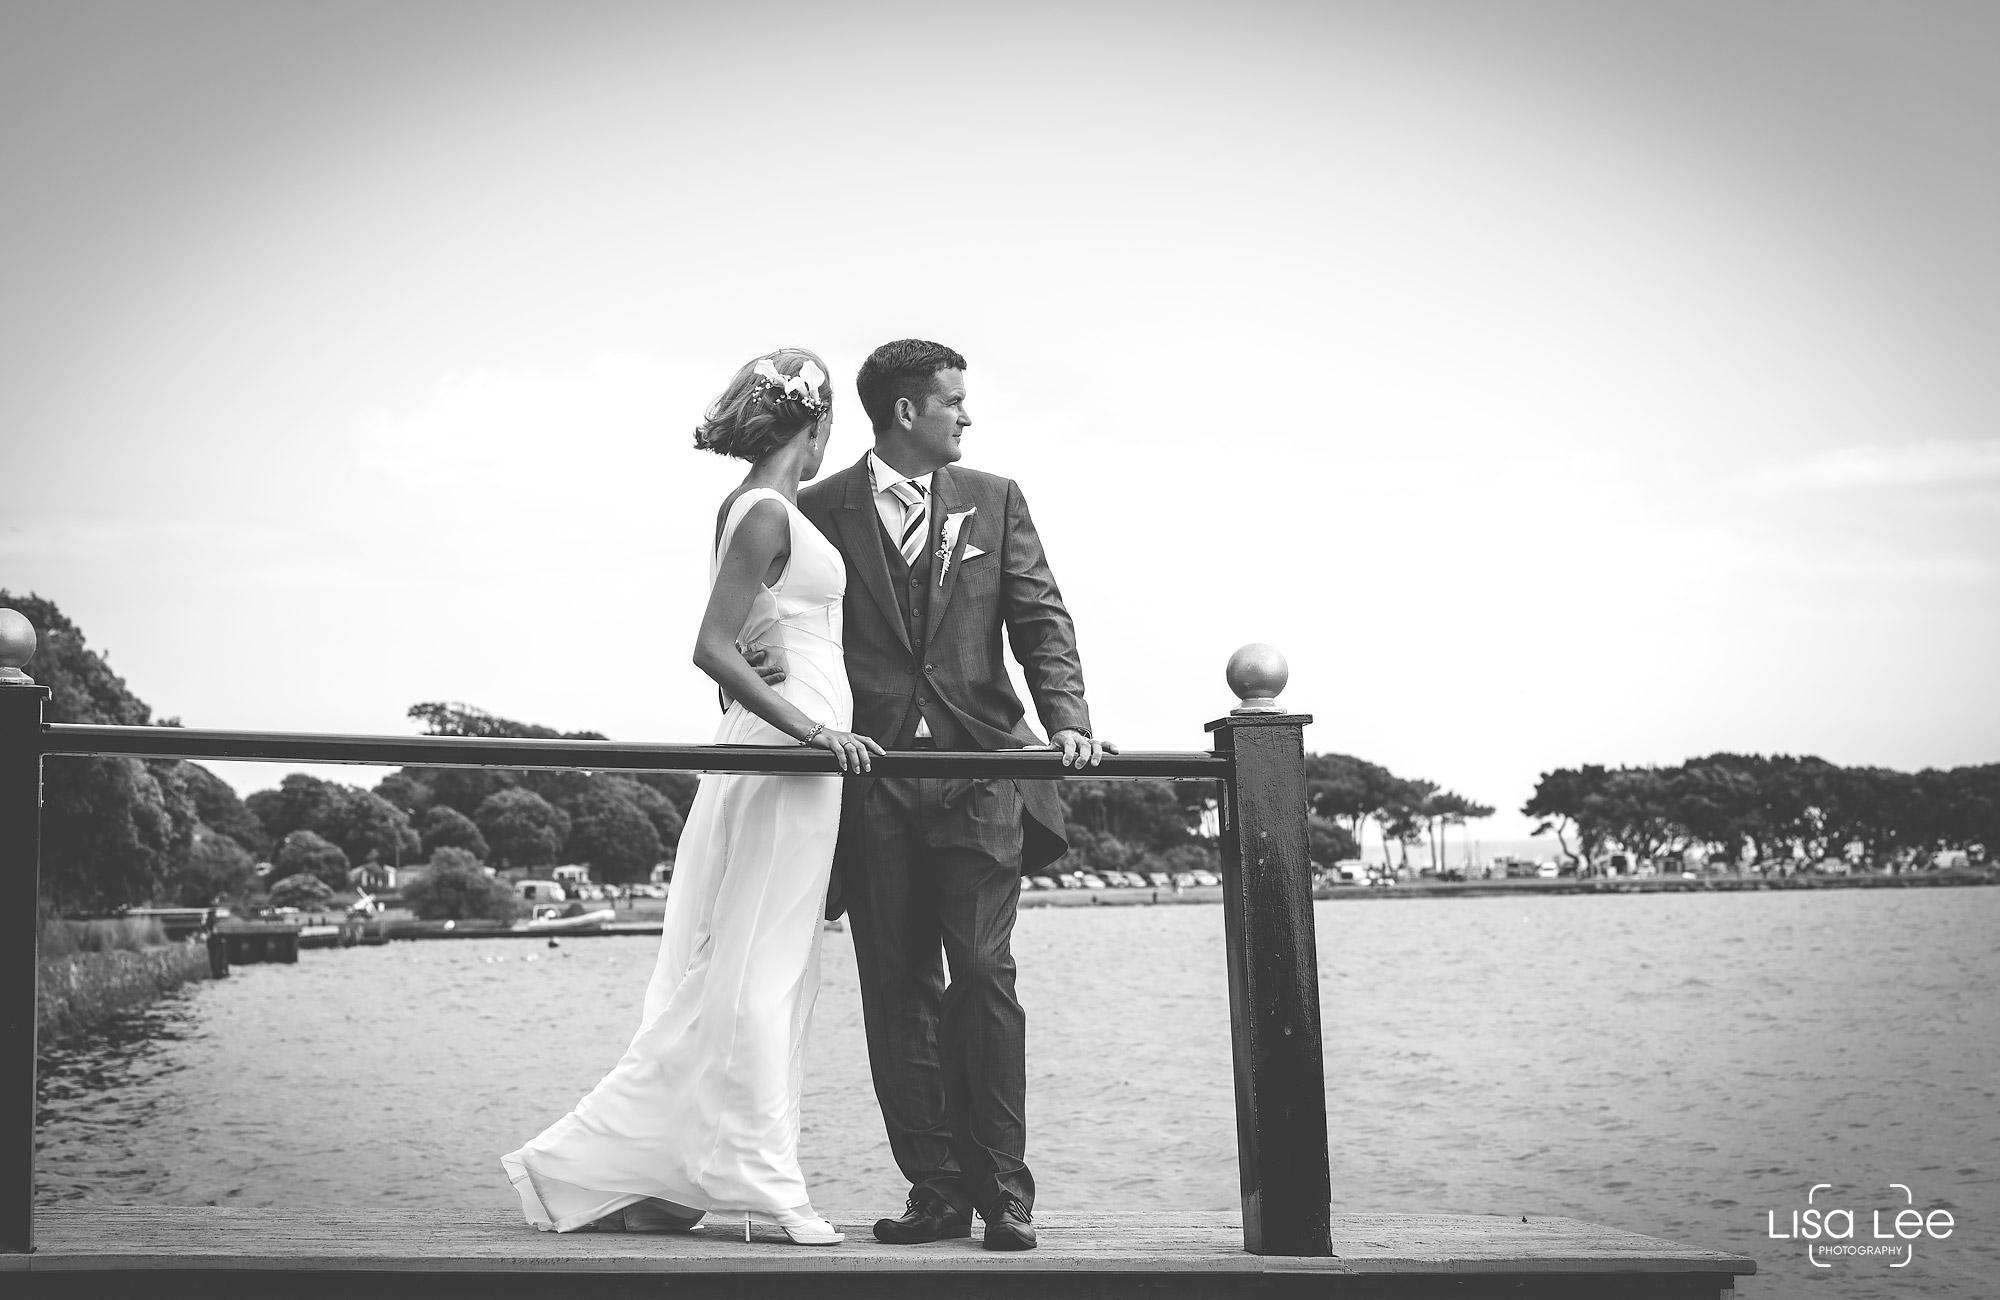 lisa-lee-wedding-photography-christchurch-dorset-bridegroom3.jpg